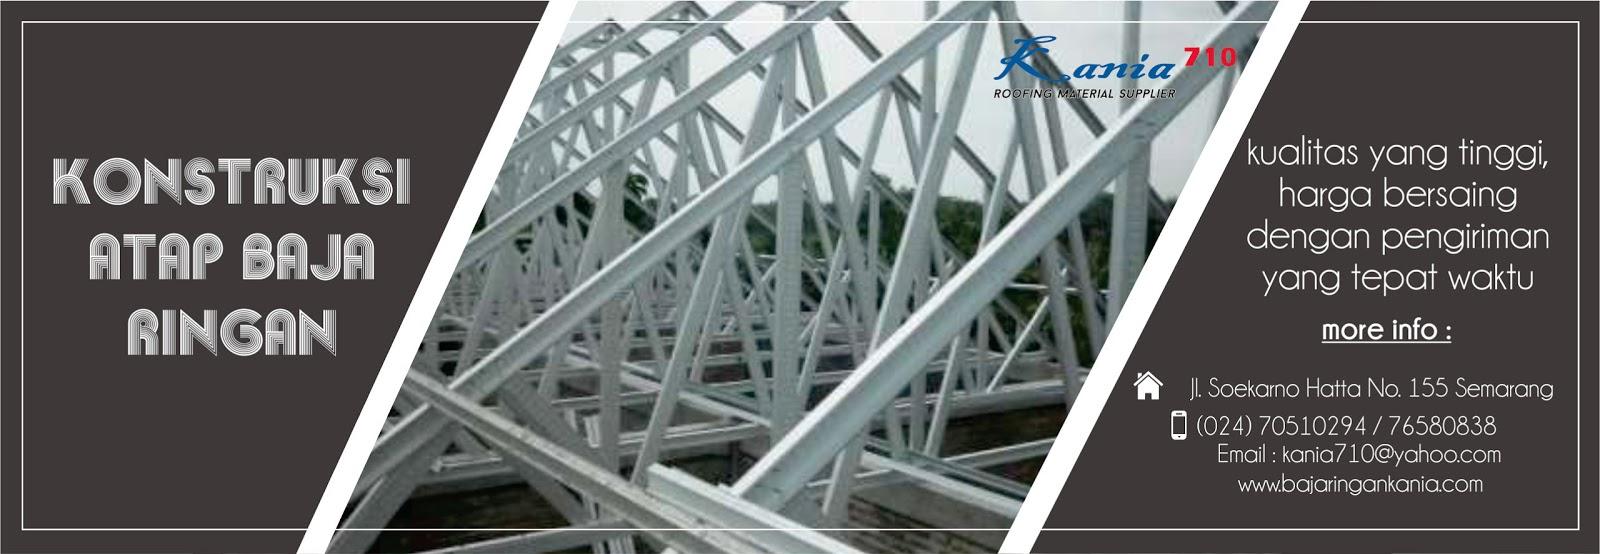 toko baja ringan kudus rangka atap lengkap berkualitas harga